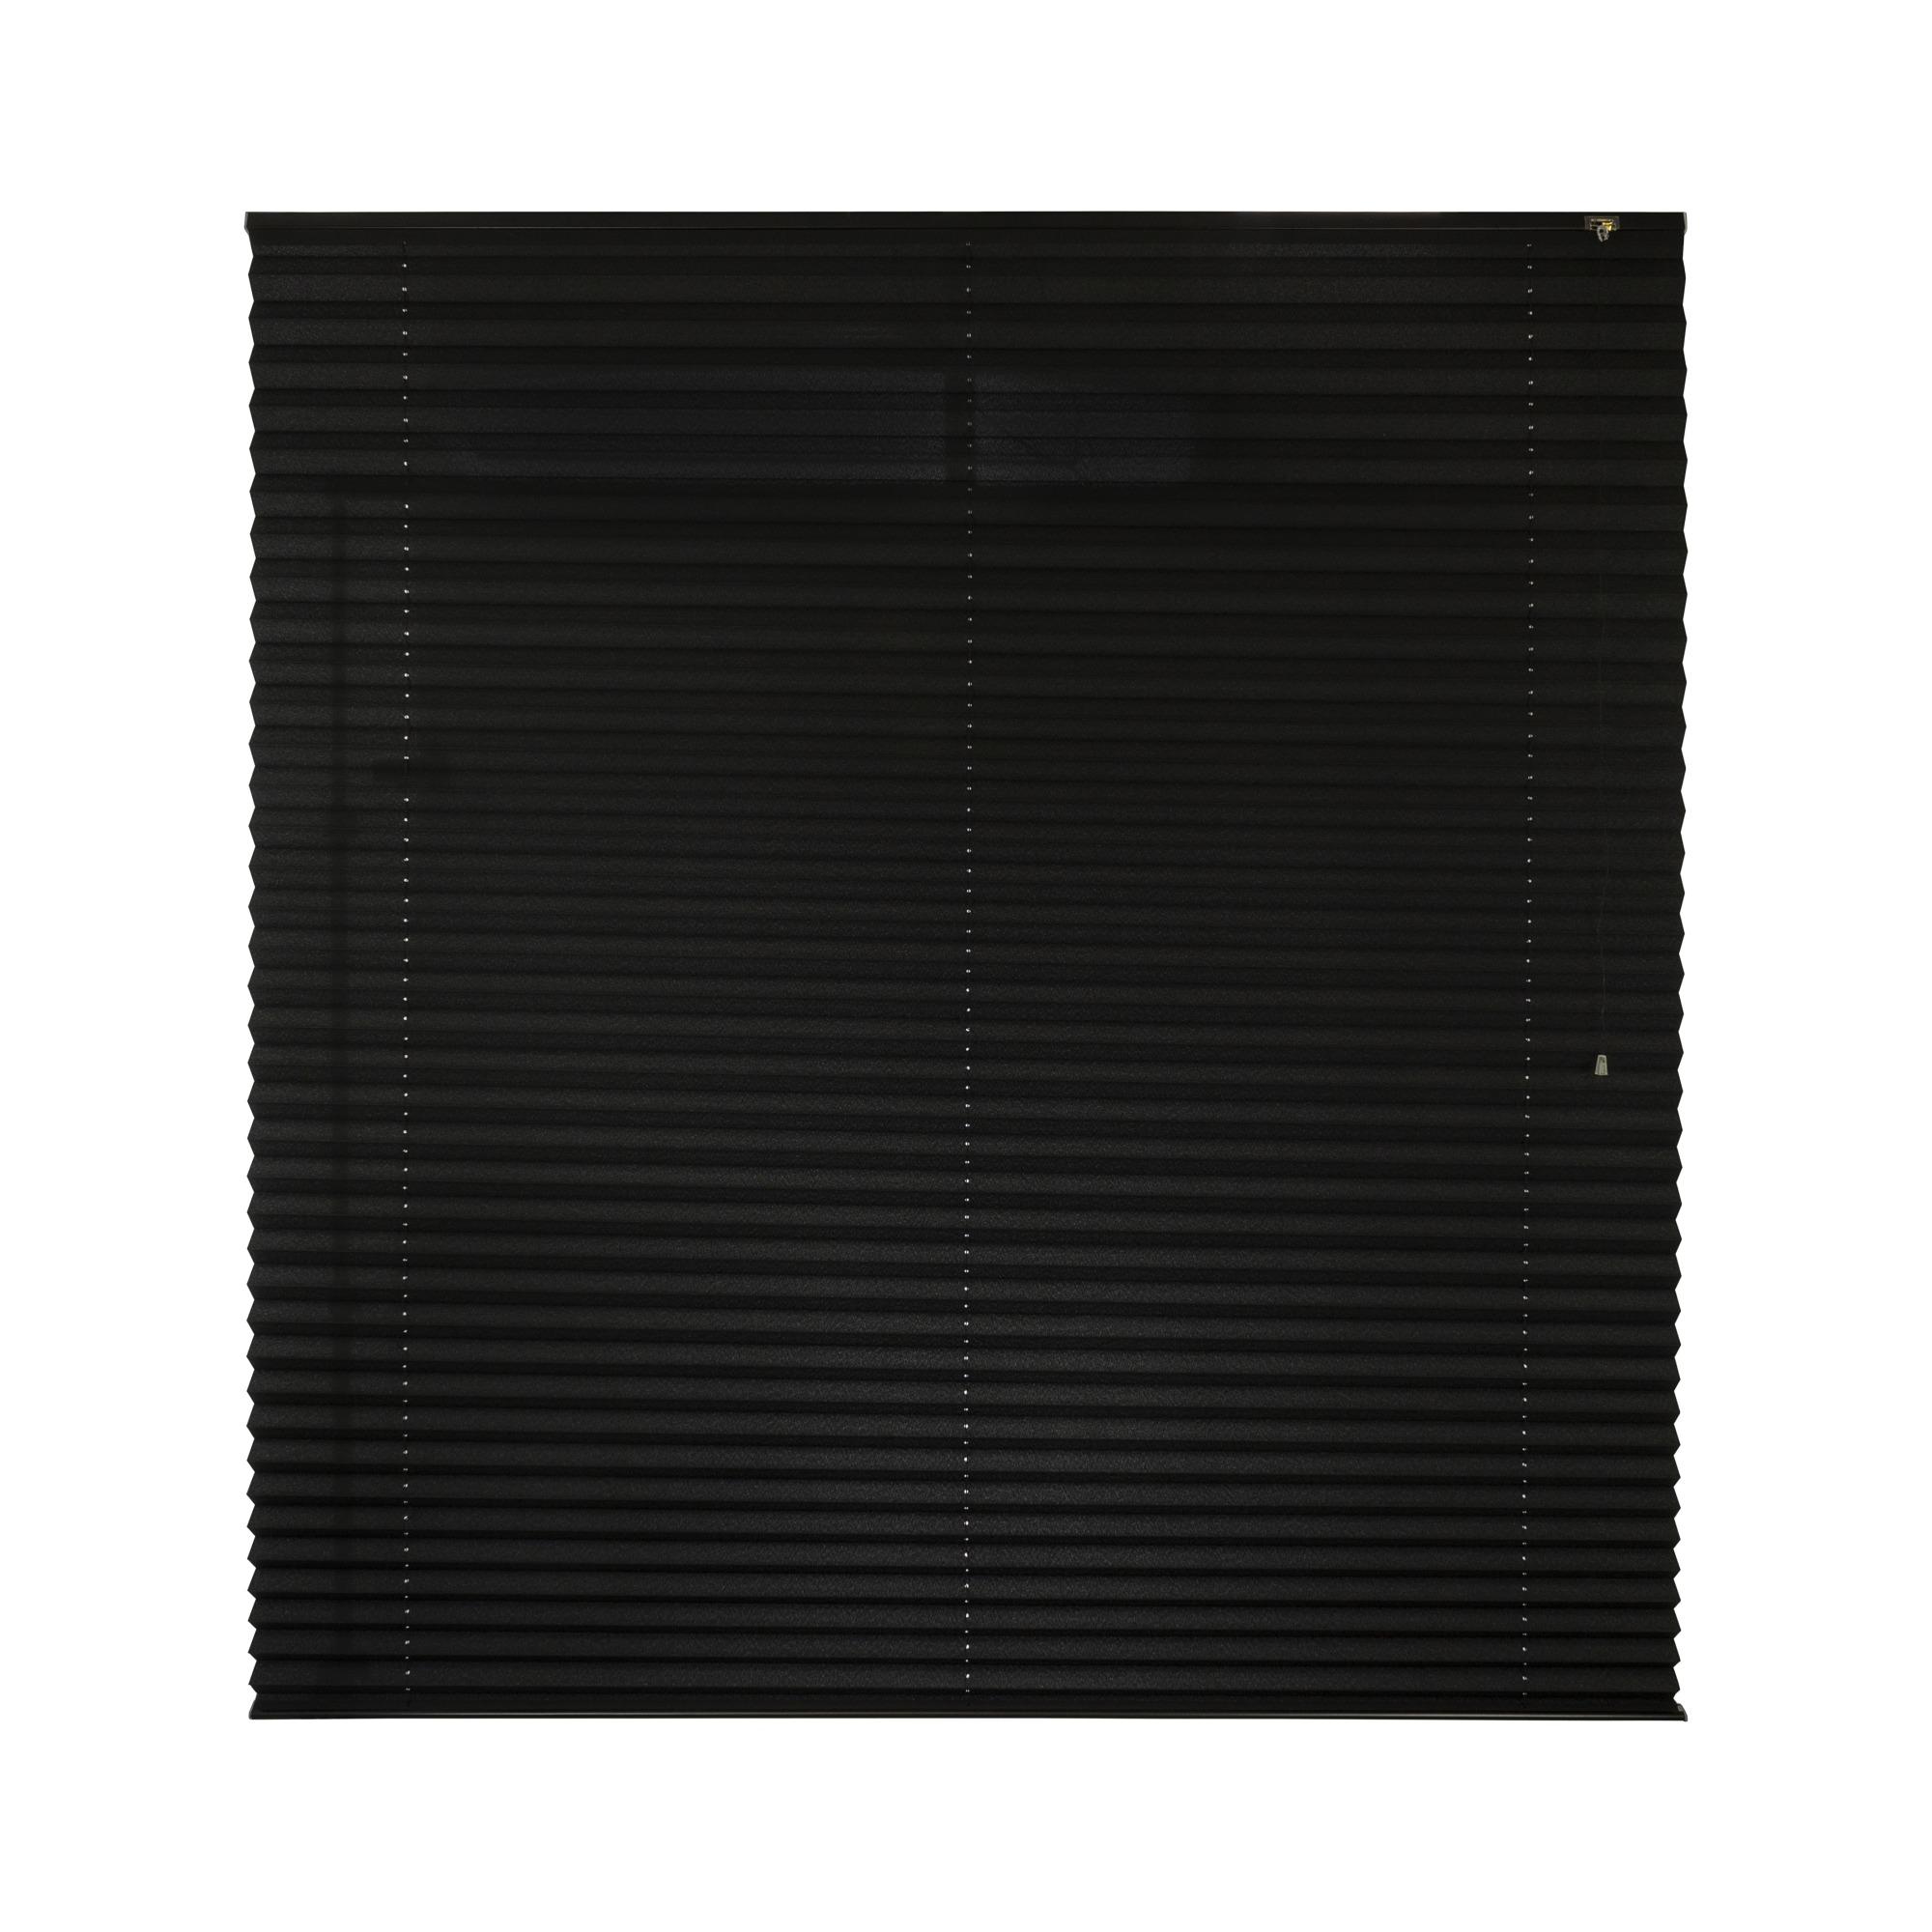 imagem de persiana pliss preta 150x140 - liyangjpg